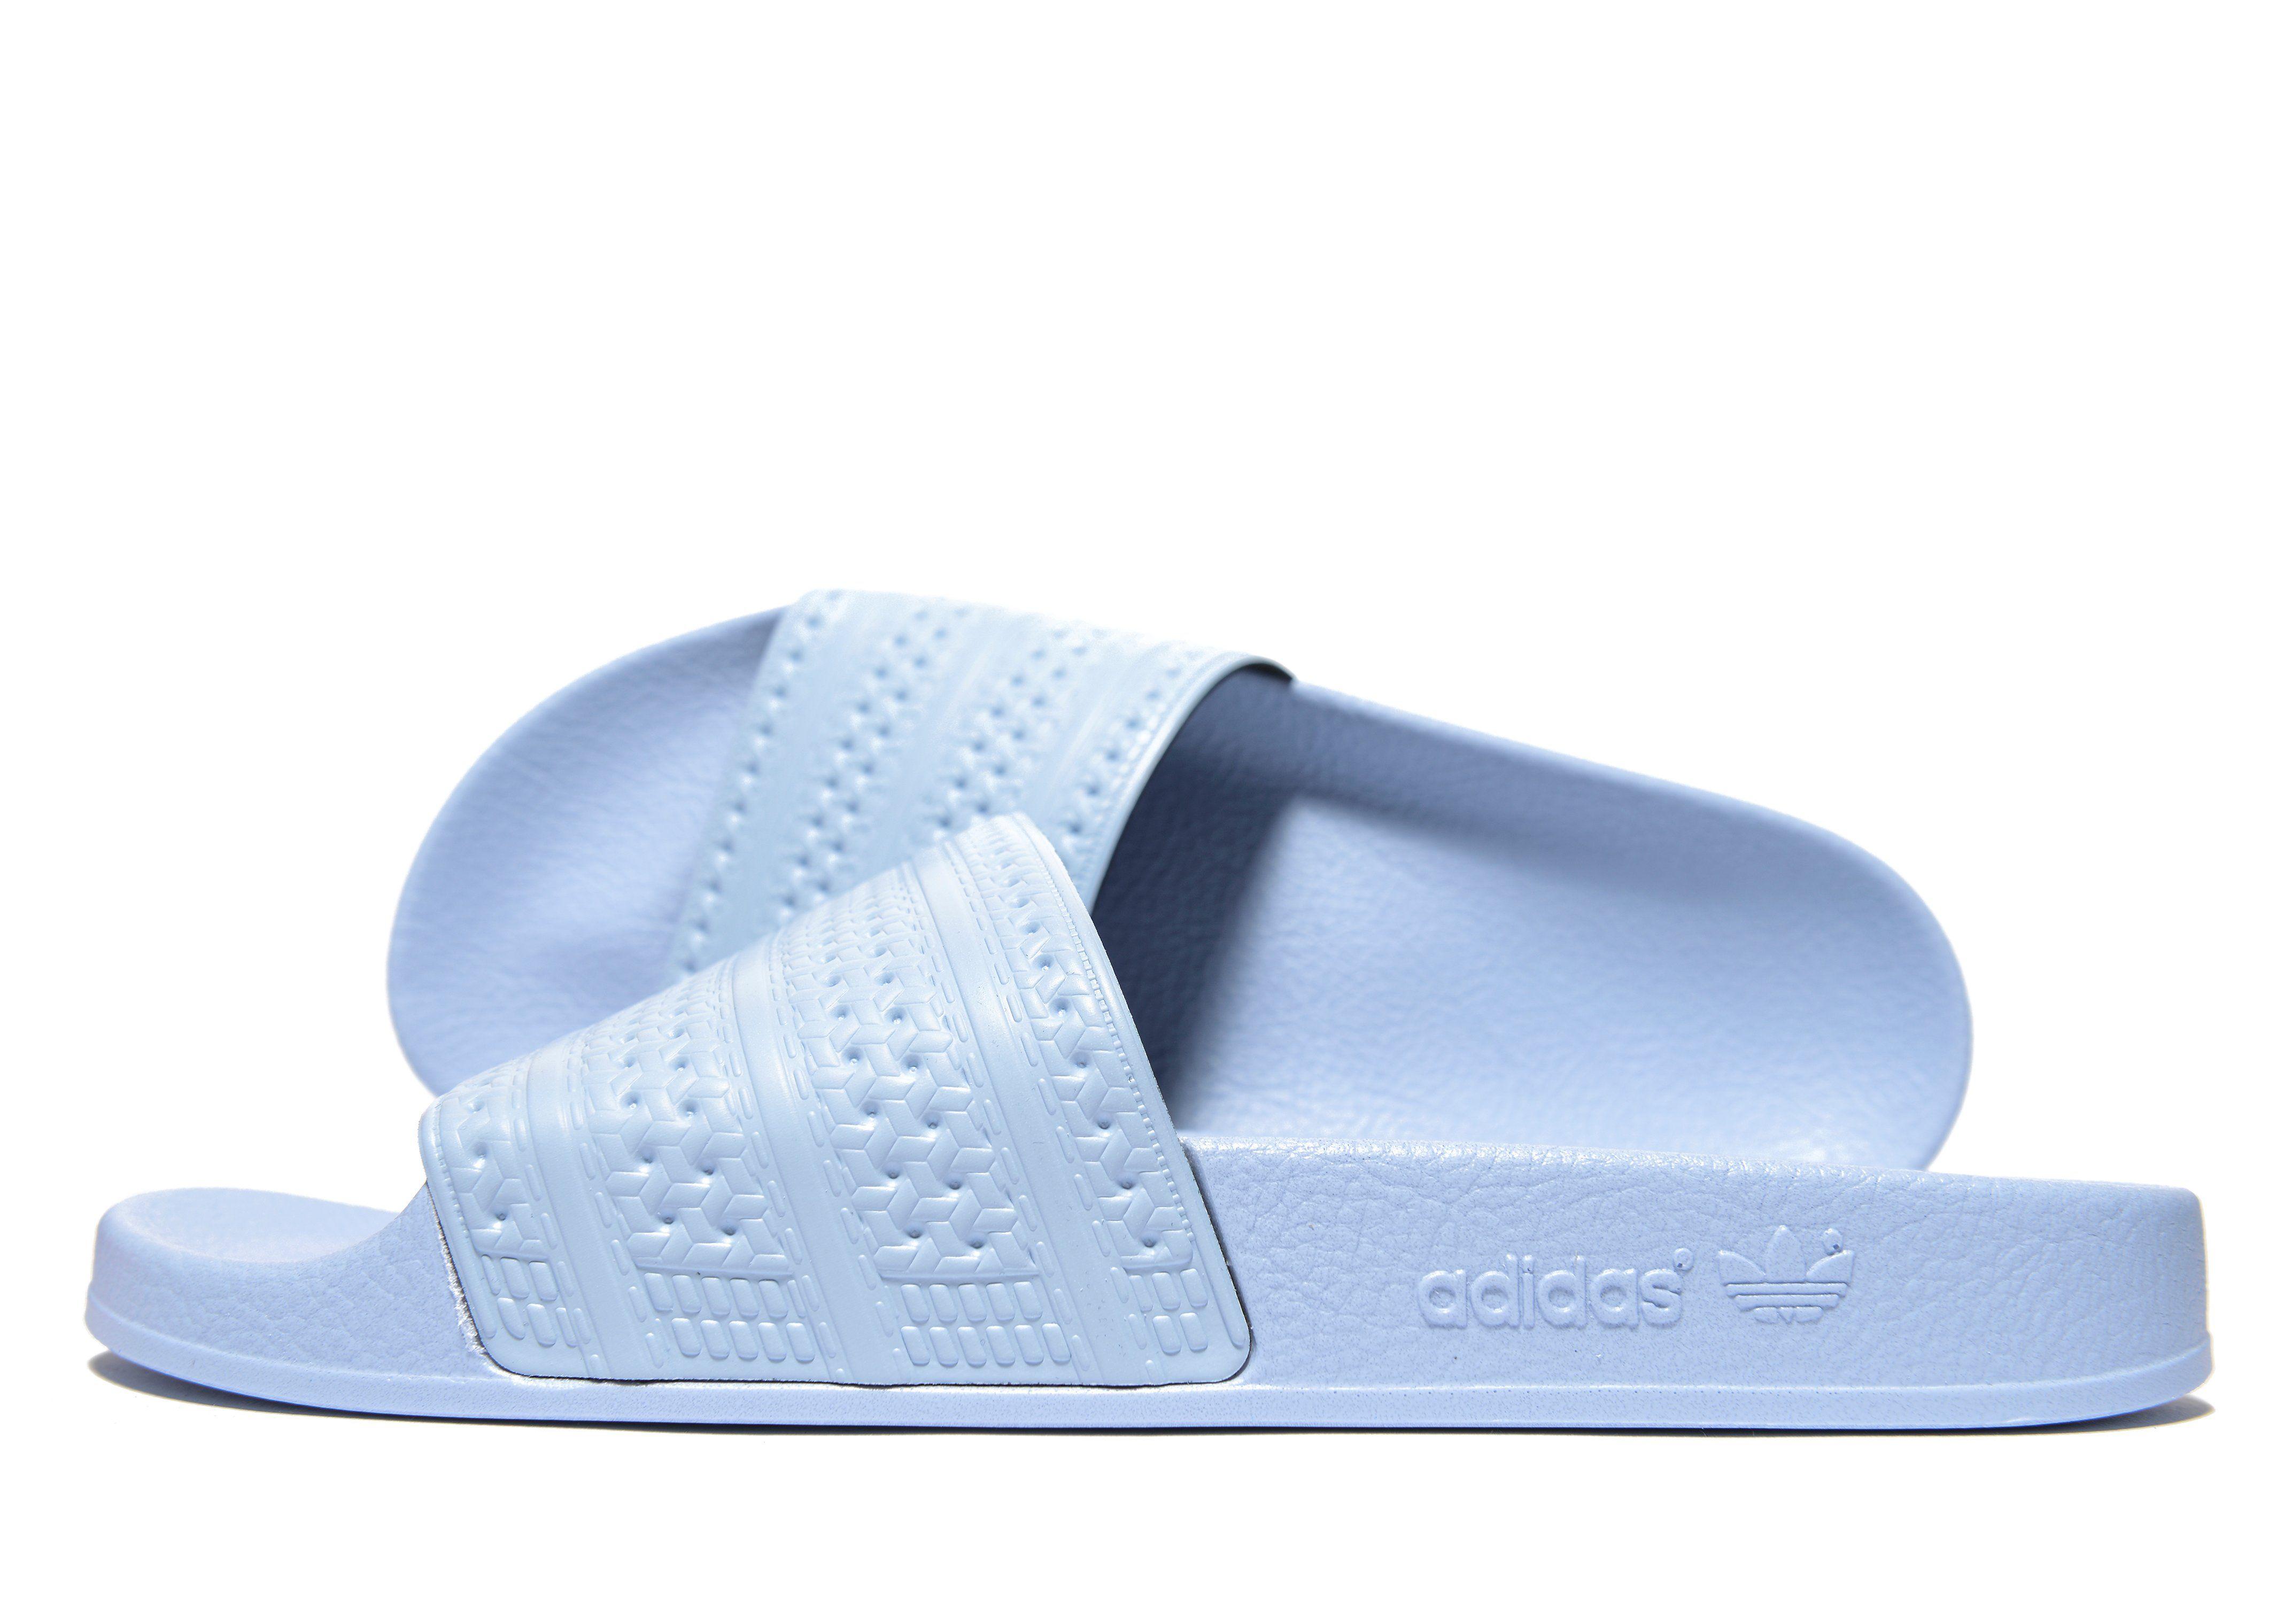 d7d16e94494a3 adidas Originals Adilette Slides